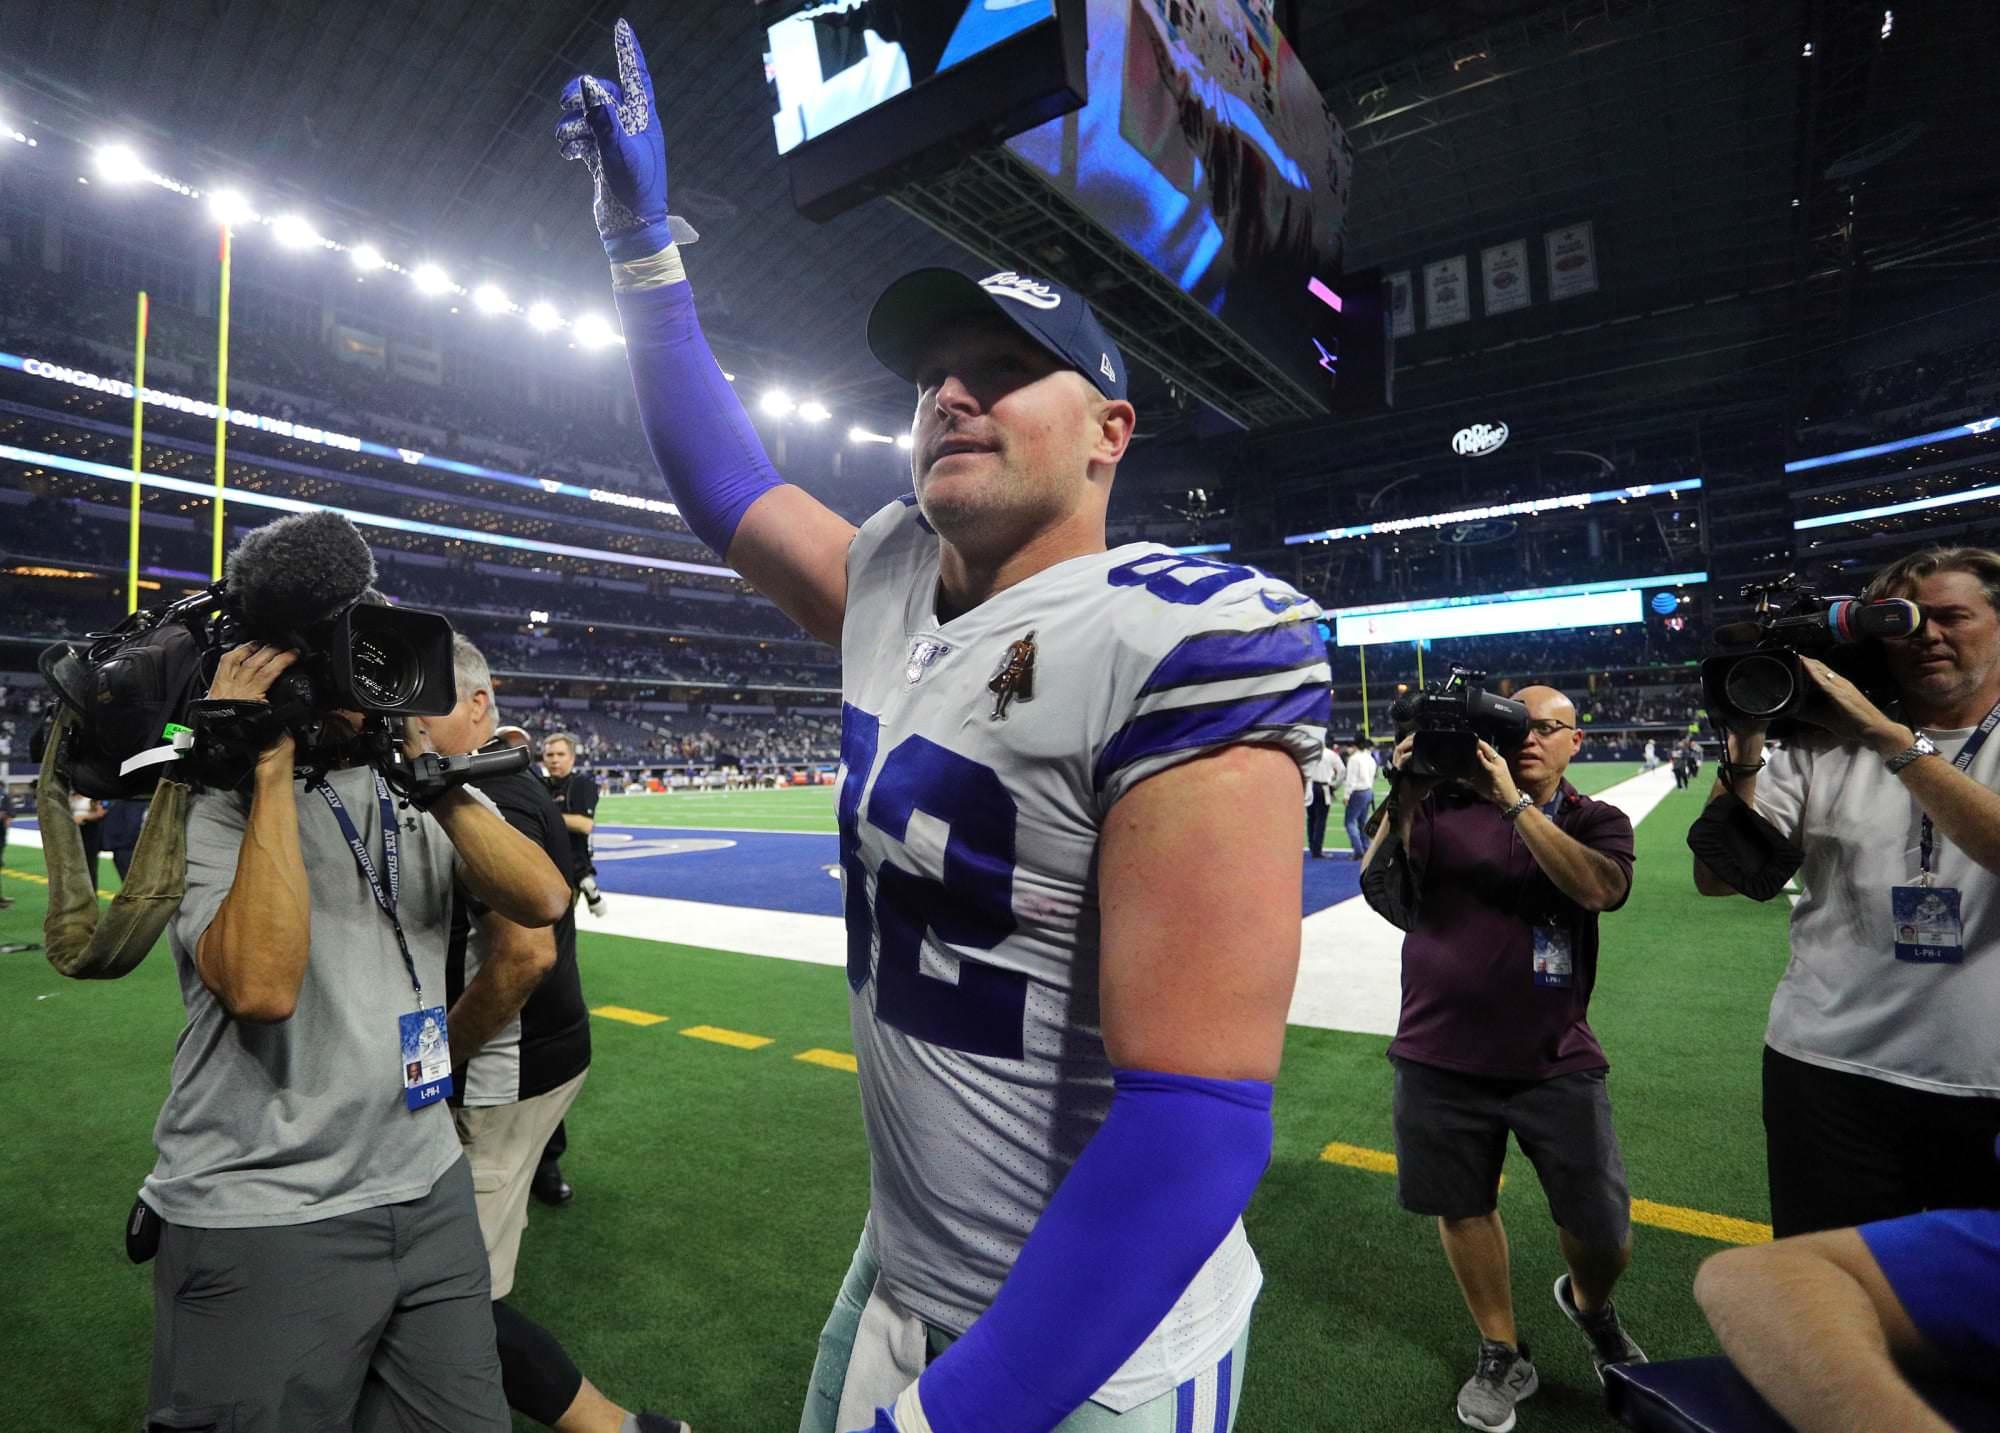 Jason Witten vai se aposentar e encerrar as coisas com os Cowboys